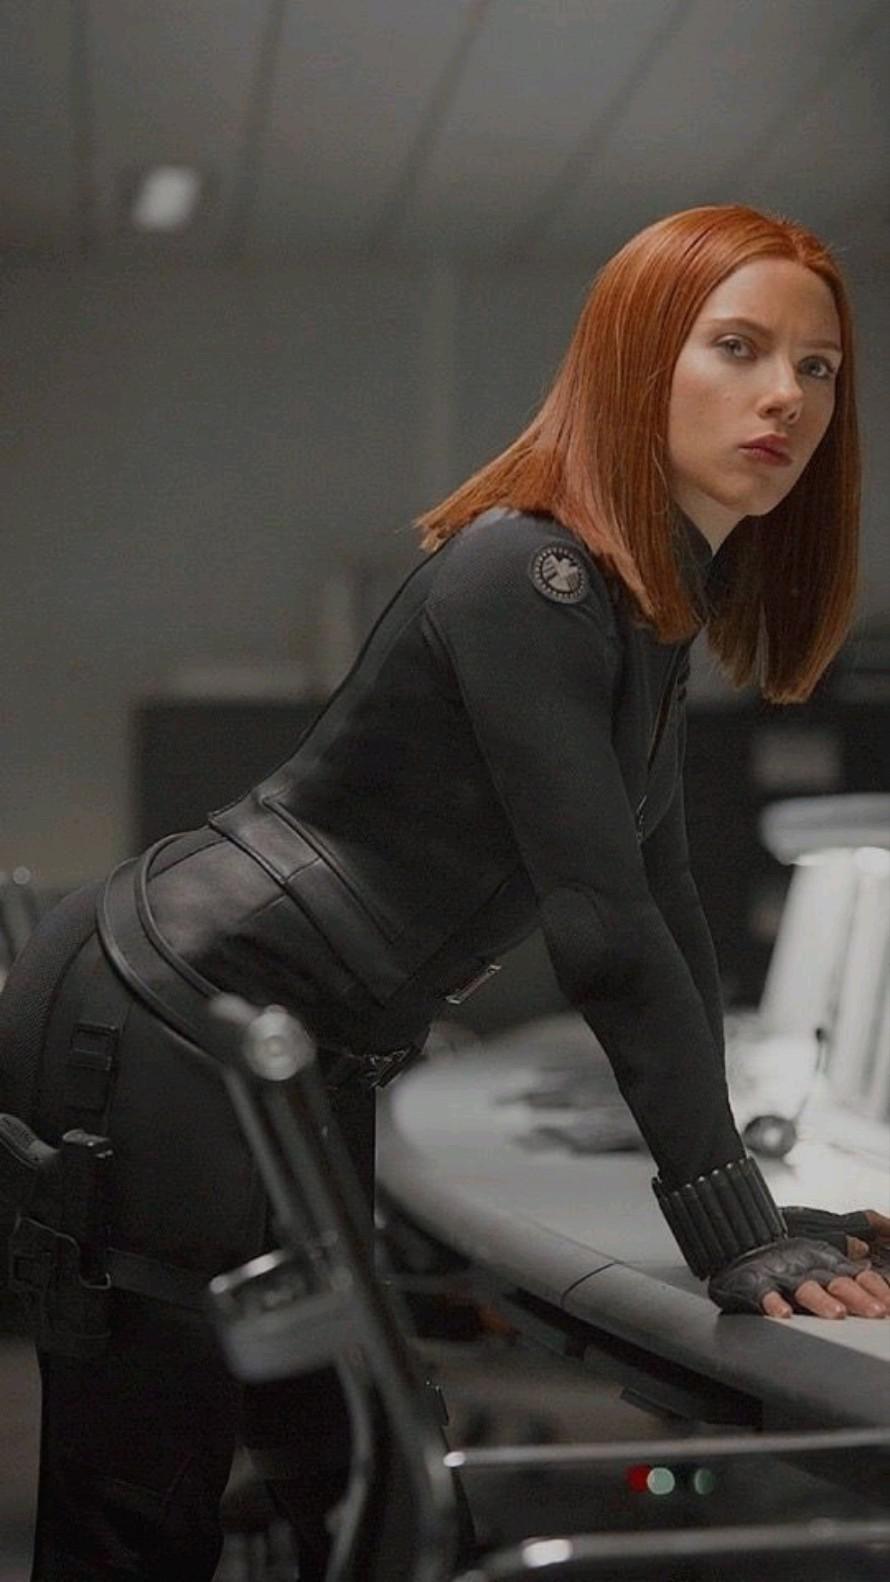 Scarlett Johansson as Blackwidow ❤️ #wallpapers #marvel #scarlett #blackwidow #marvelwallpapers #fyp